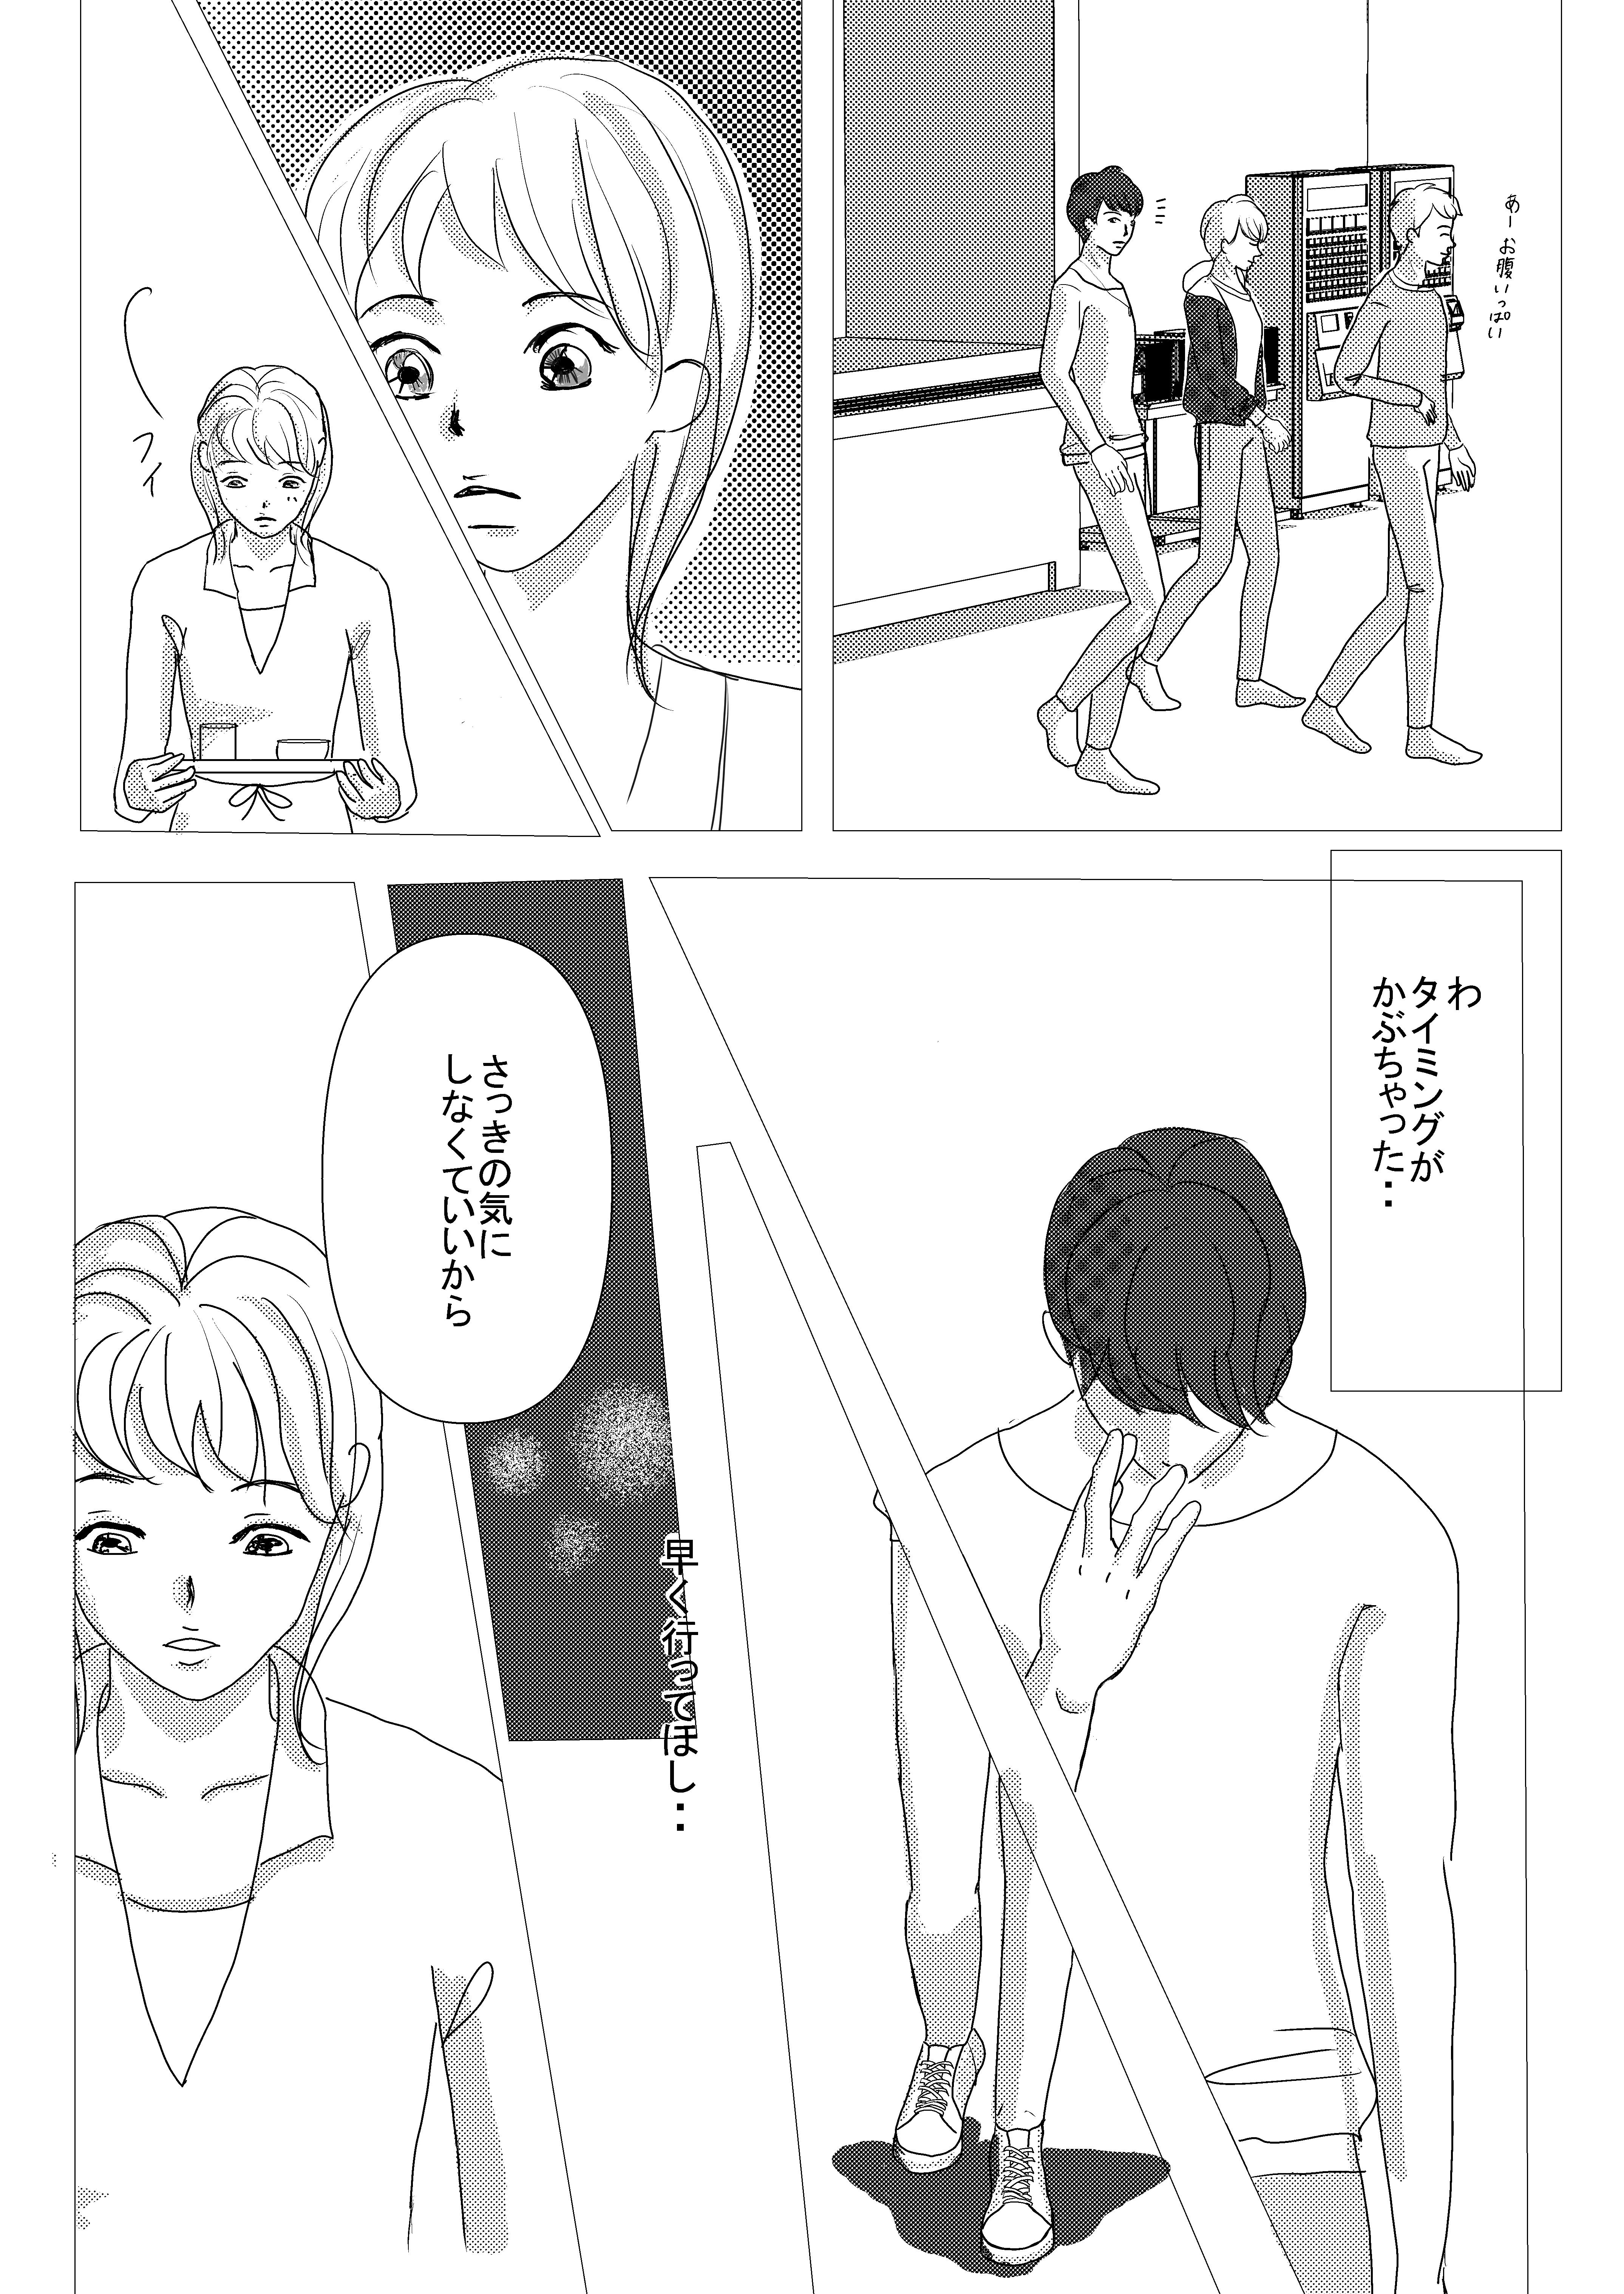 恋愛漫画/大学生/社会人/shoujyo manga/米加夢/12ページ